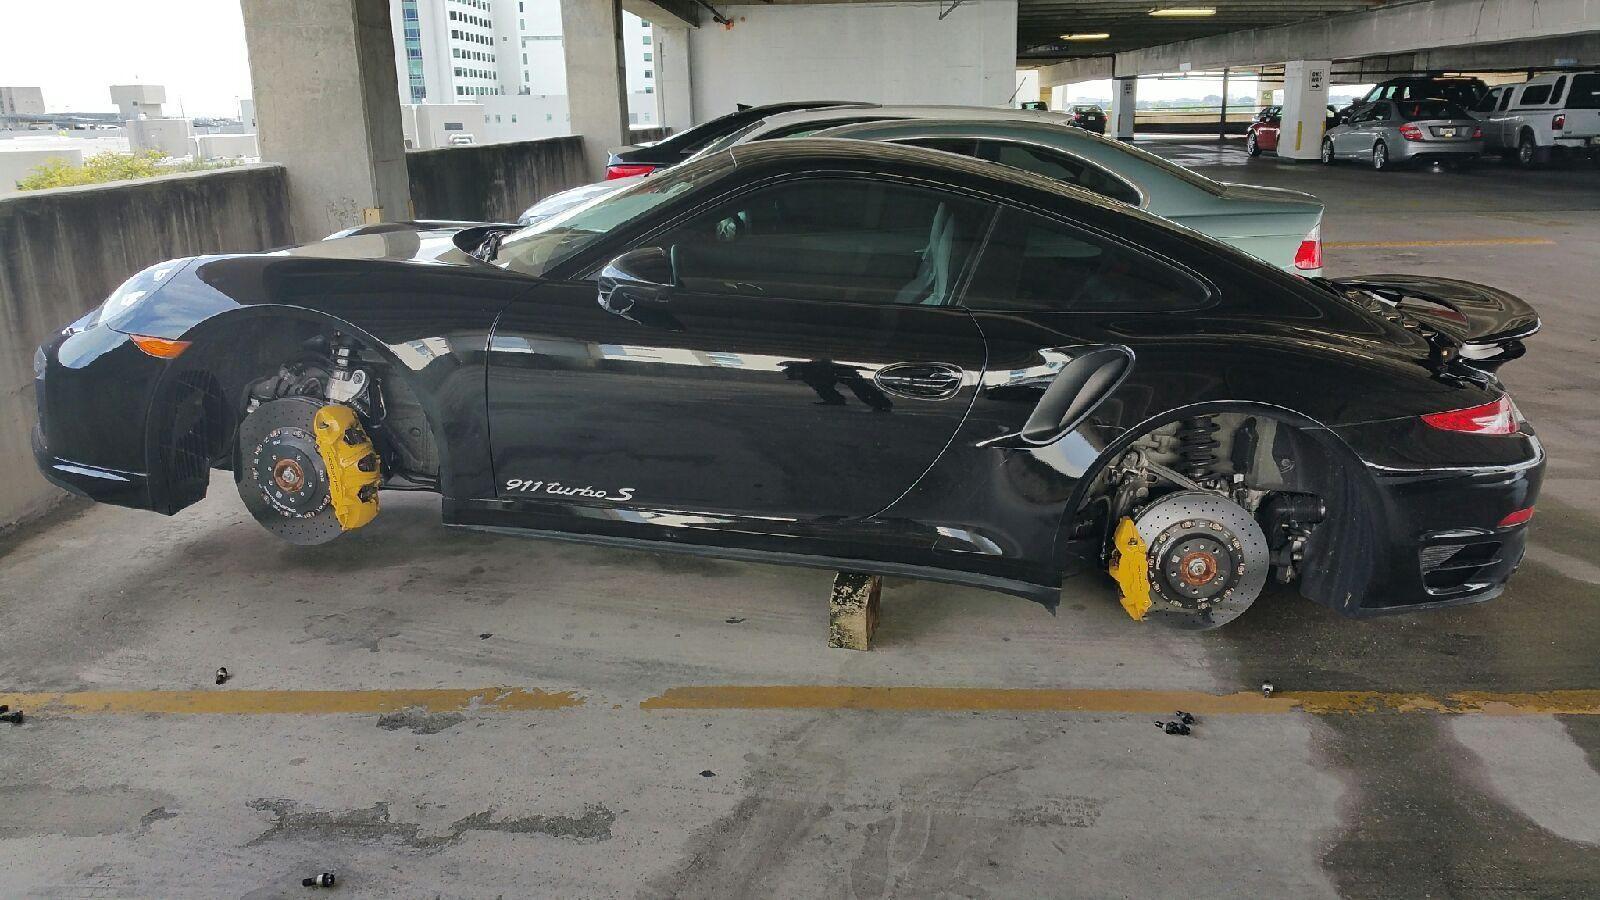 Facebook Car Parts For Sale South Florida